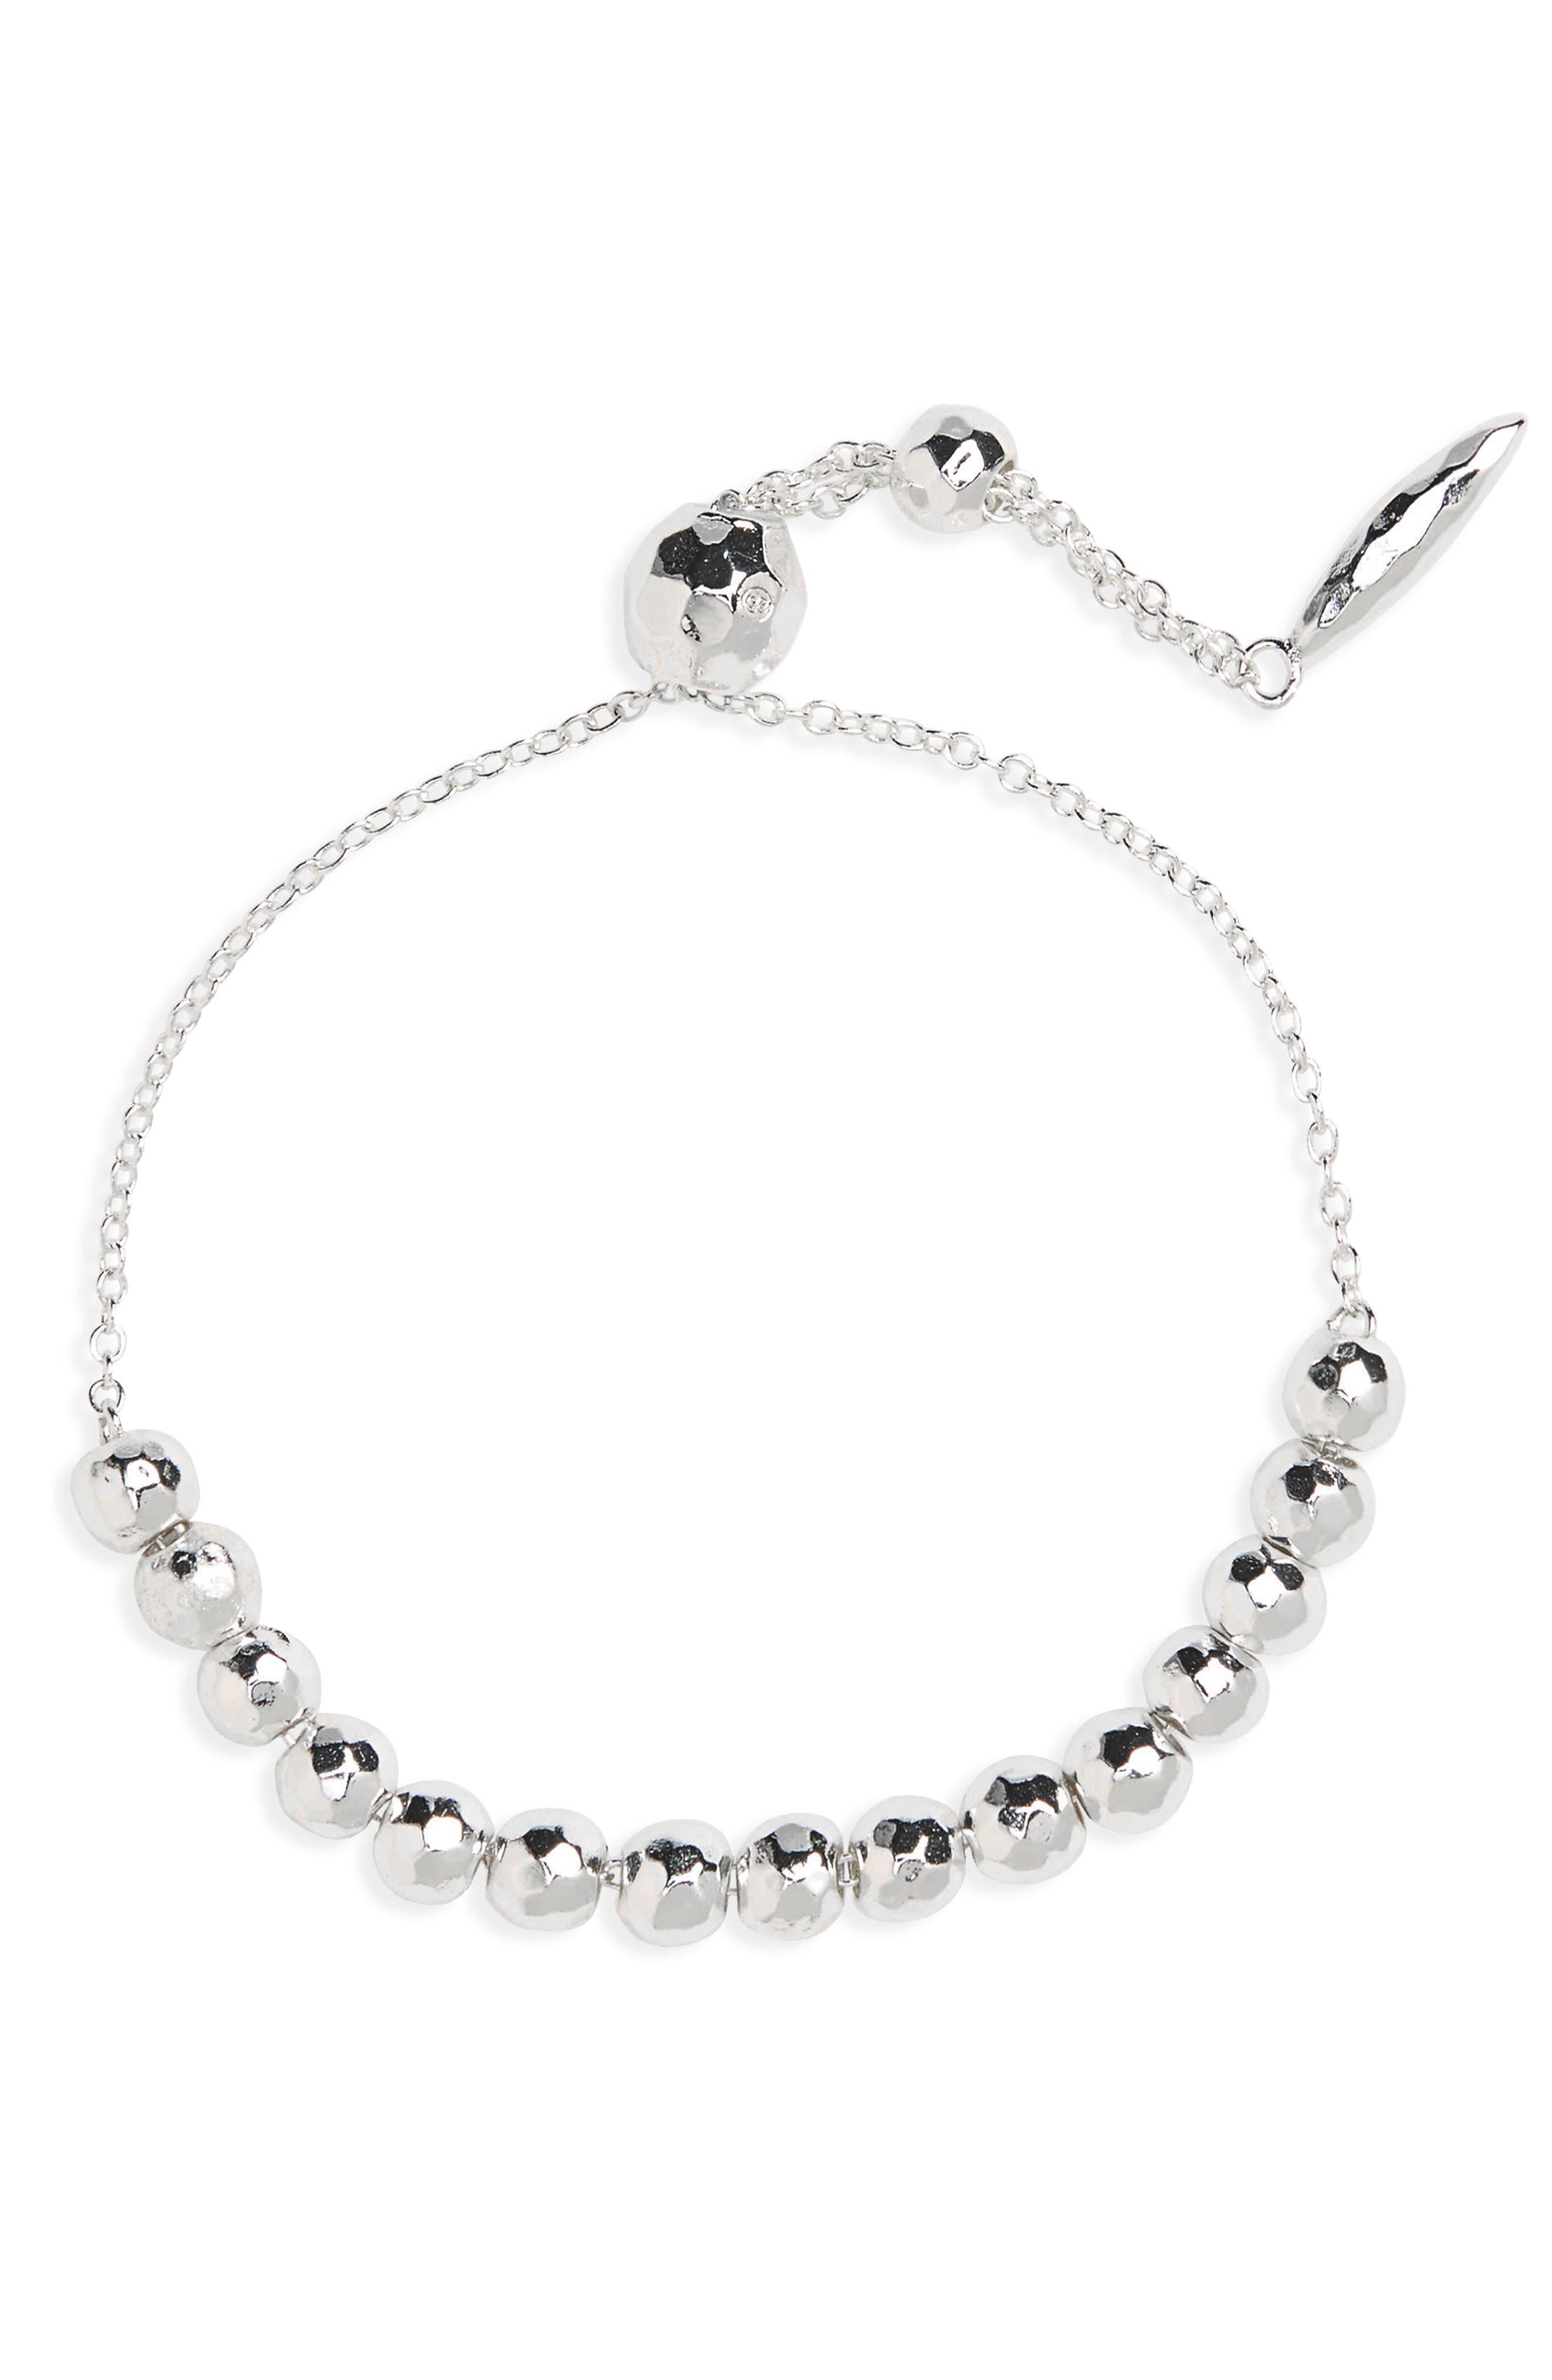 GORJANA, Laguna Adjustable Bracelet, Main thumbnail 1, color, SILVER